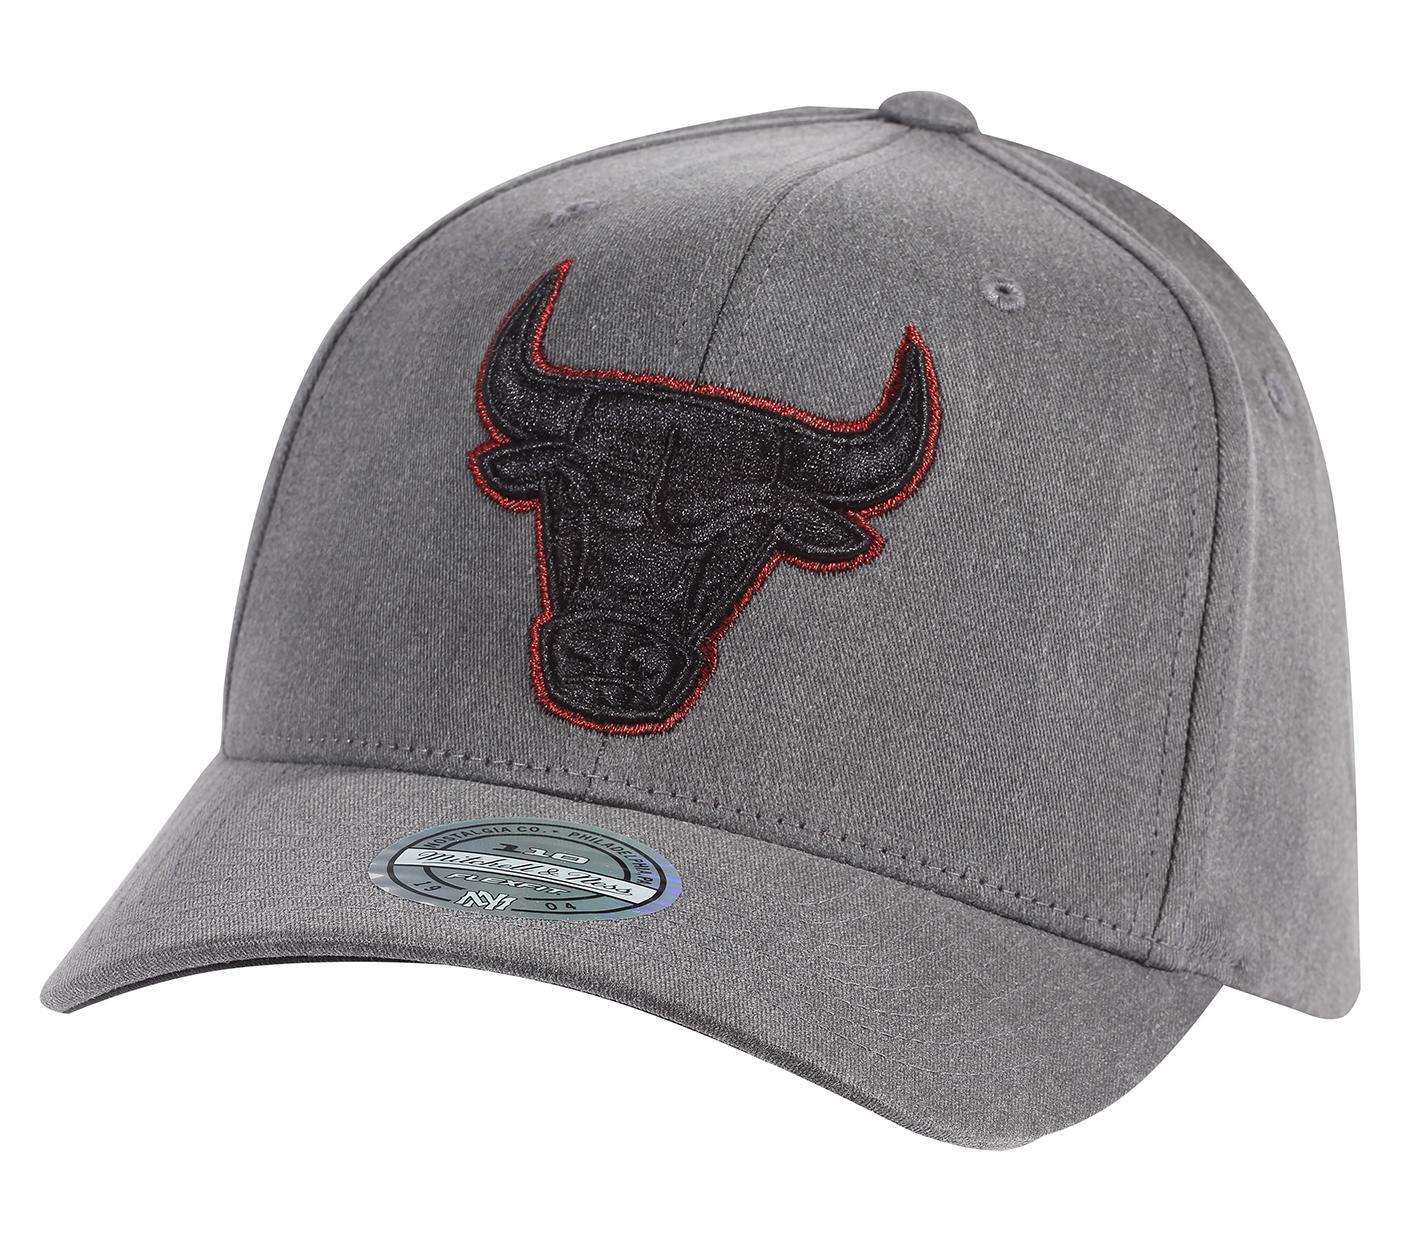 8ab4b6ab Mitchell & Ness | Chicago Bulls Washed Denim 110 Snapback